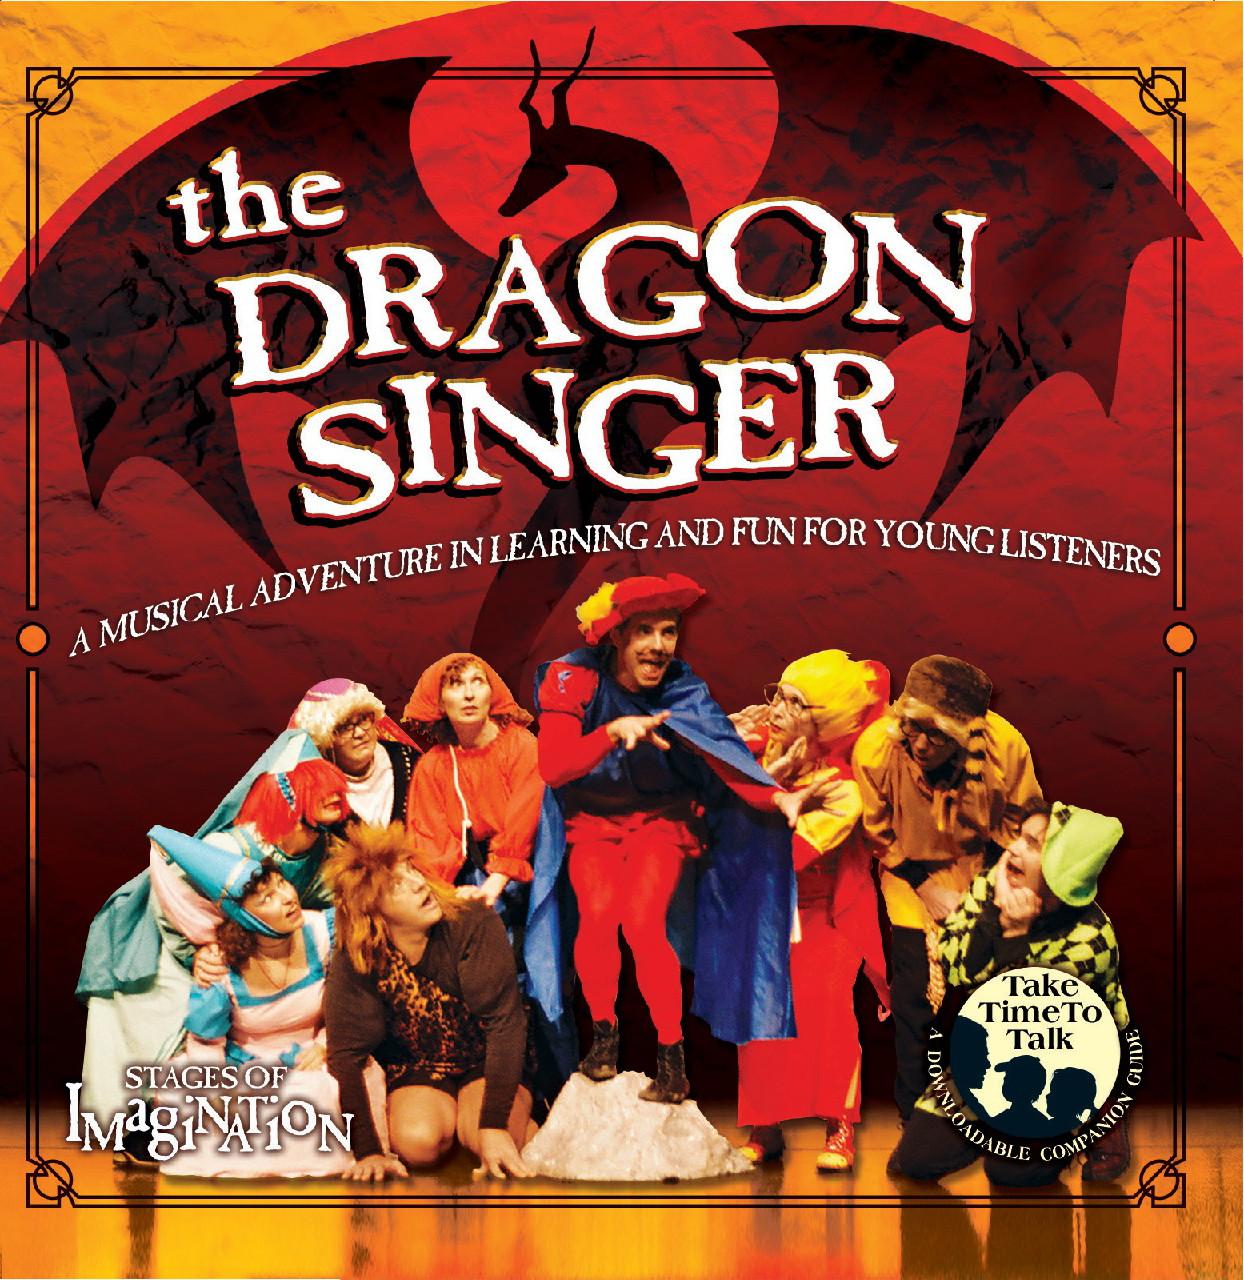 The Dragon Singer